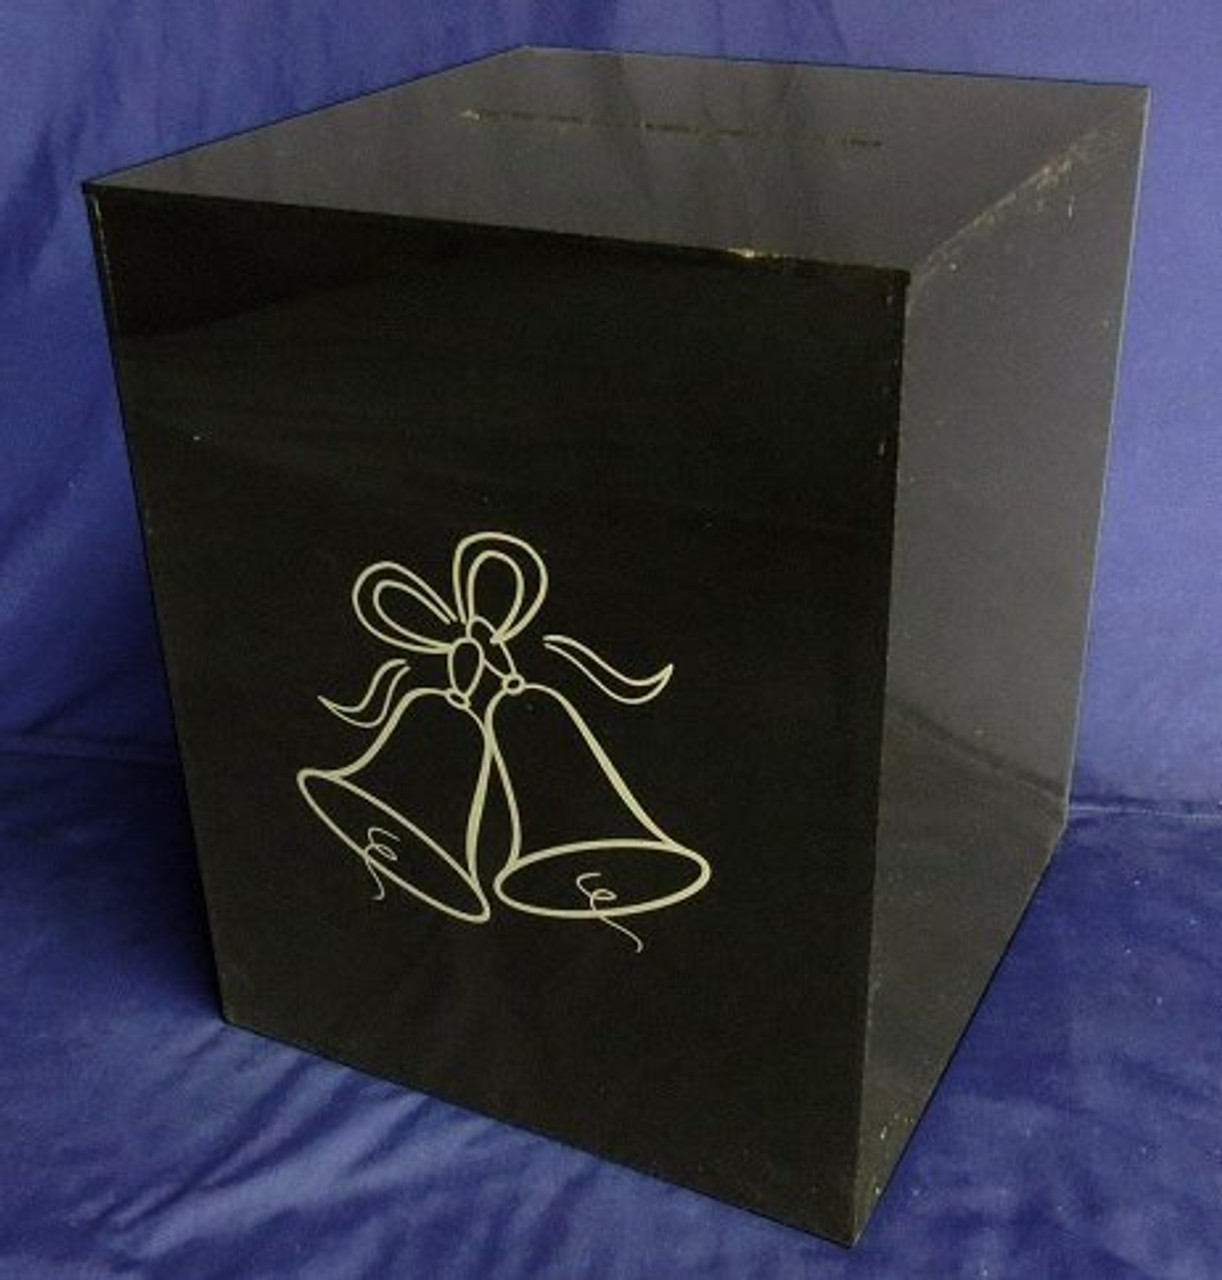 ACRYLIC WEDDING CARD BOX - BLACK